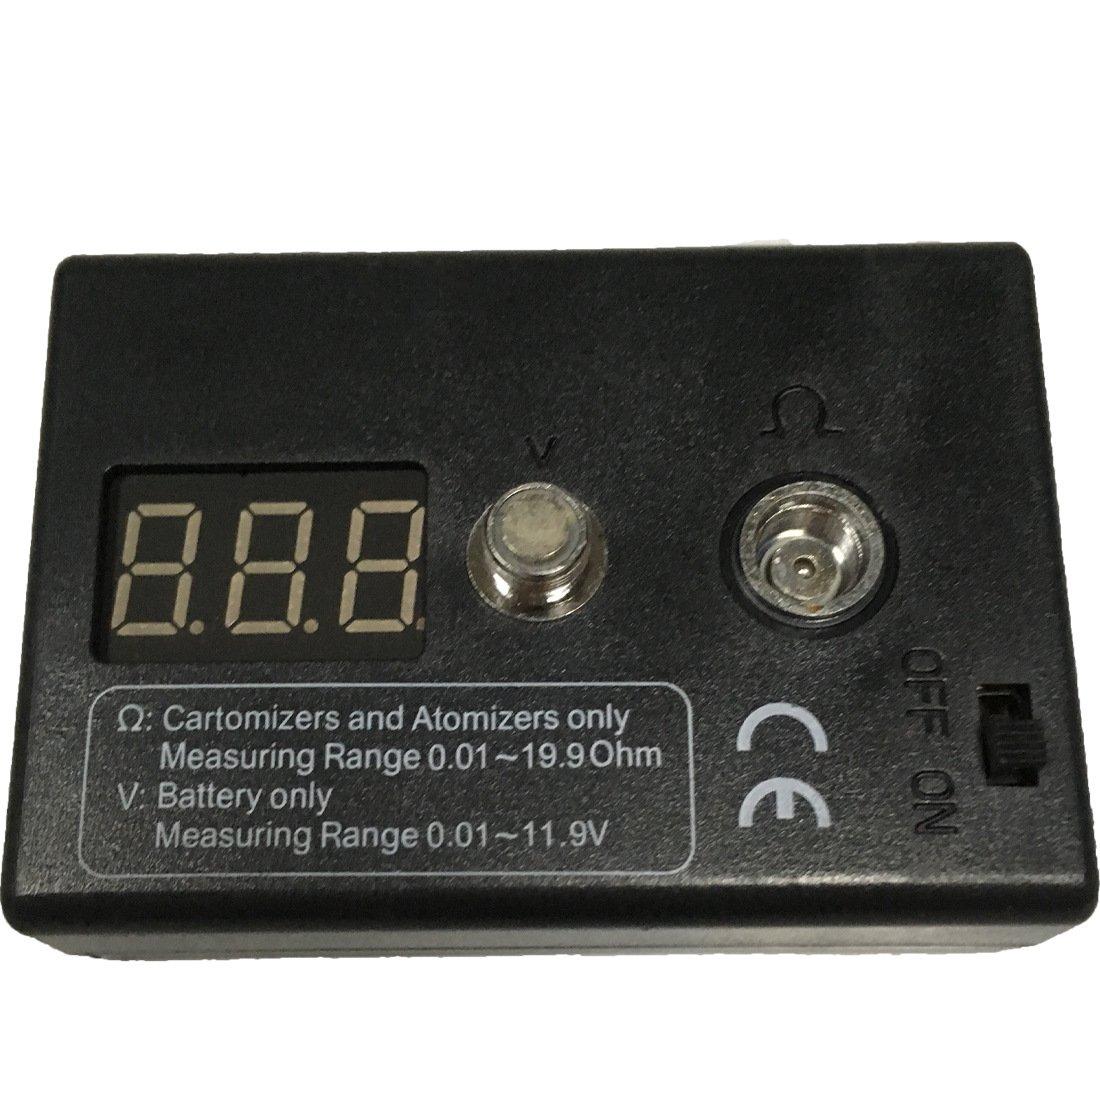 Tuopuke Black Rectange Plastic Made 510 Thread RDA RBA Resistance Tester Vape Ohm Meter Volt Meter CoiledVapr